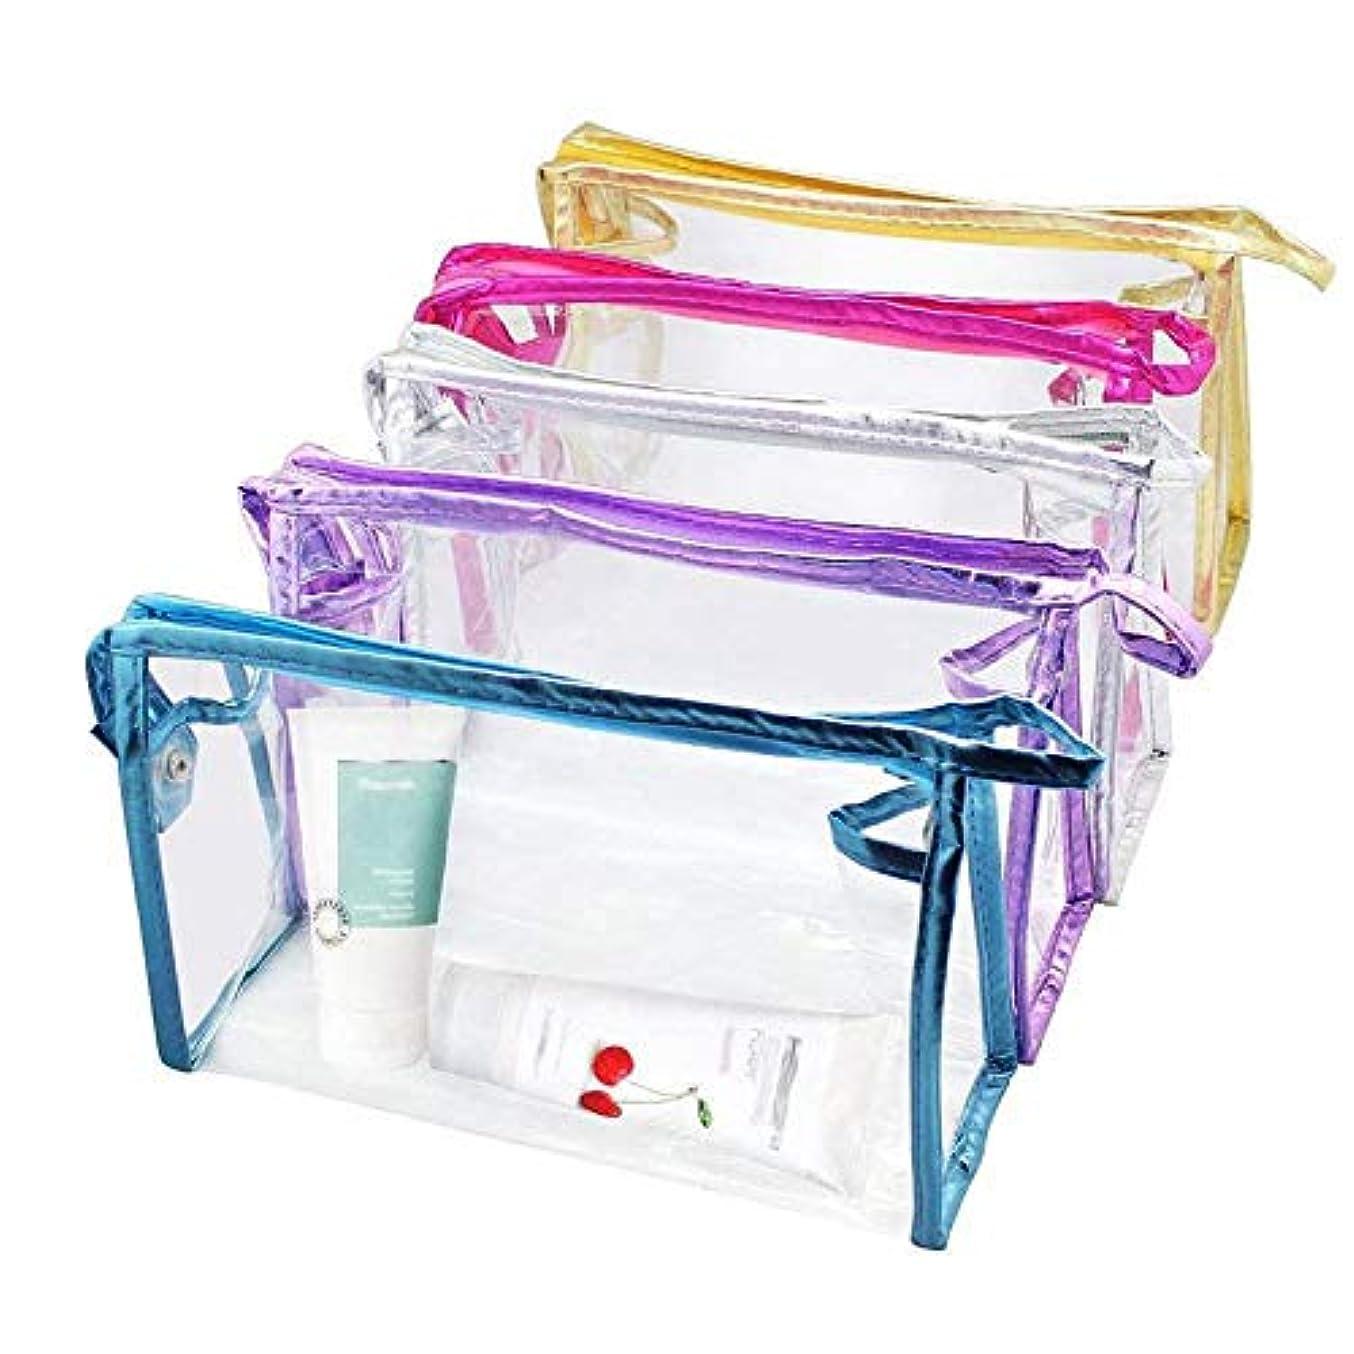 ACAMPTAR 5個透明防水化粧品バッグ、PVCビニールジッパーウォッシュバッグ休暇、バスルームと整理バッグ旅行セット